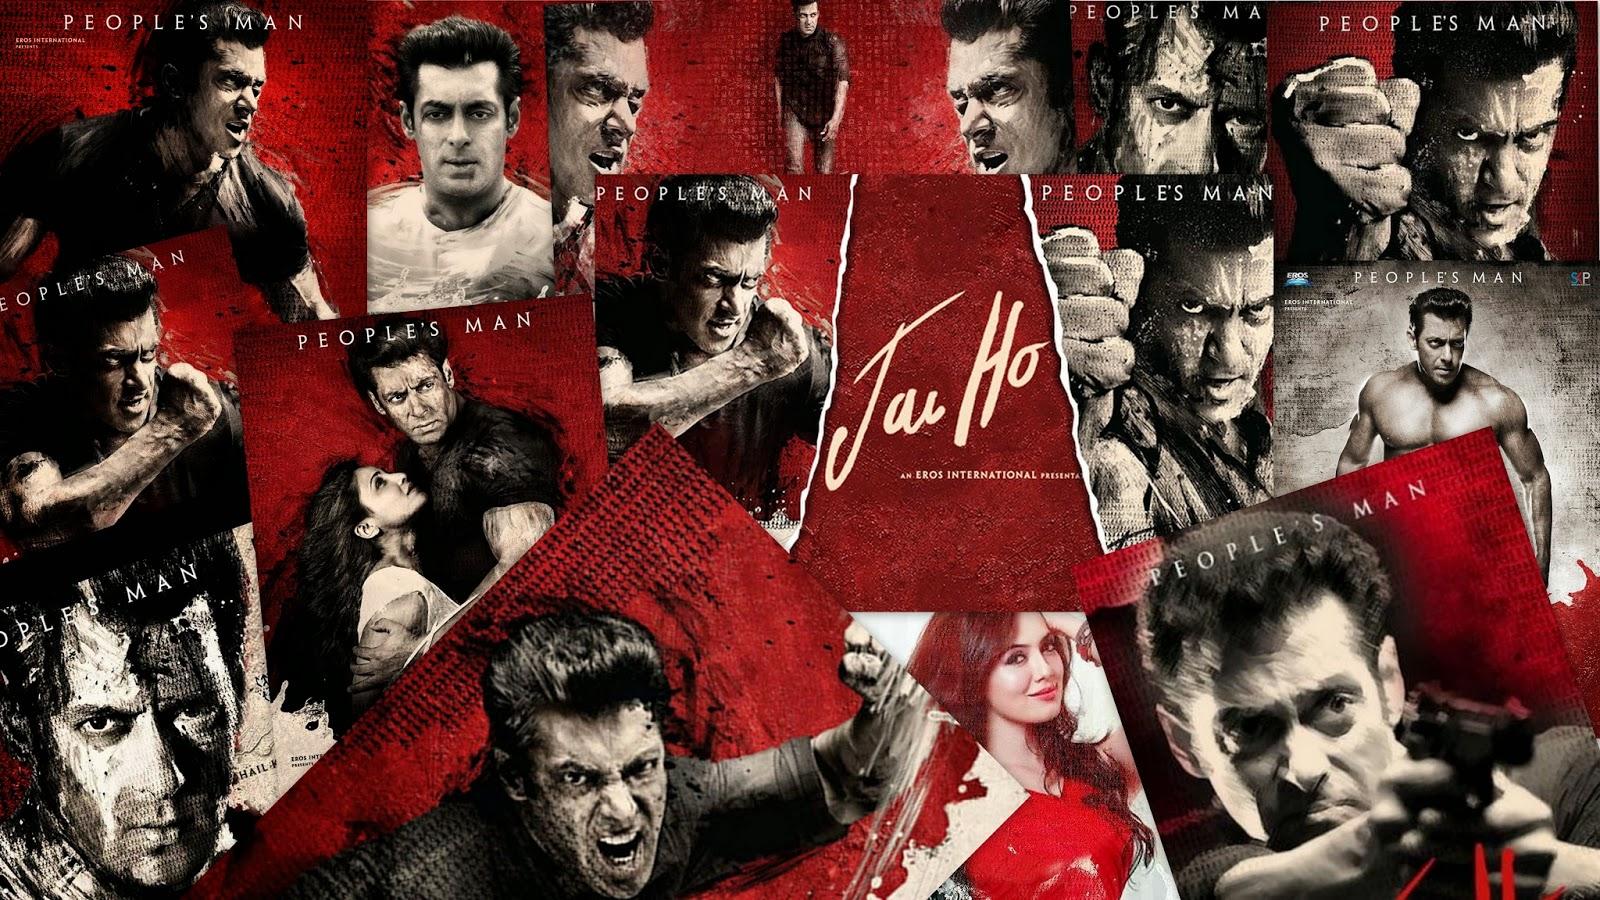 Jai Ho Posters featuring Salman Khan